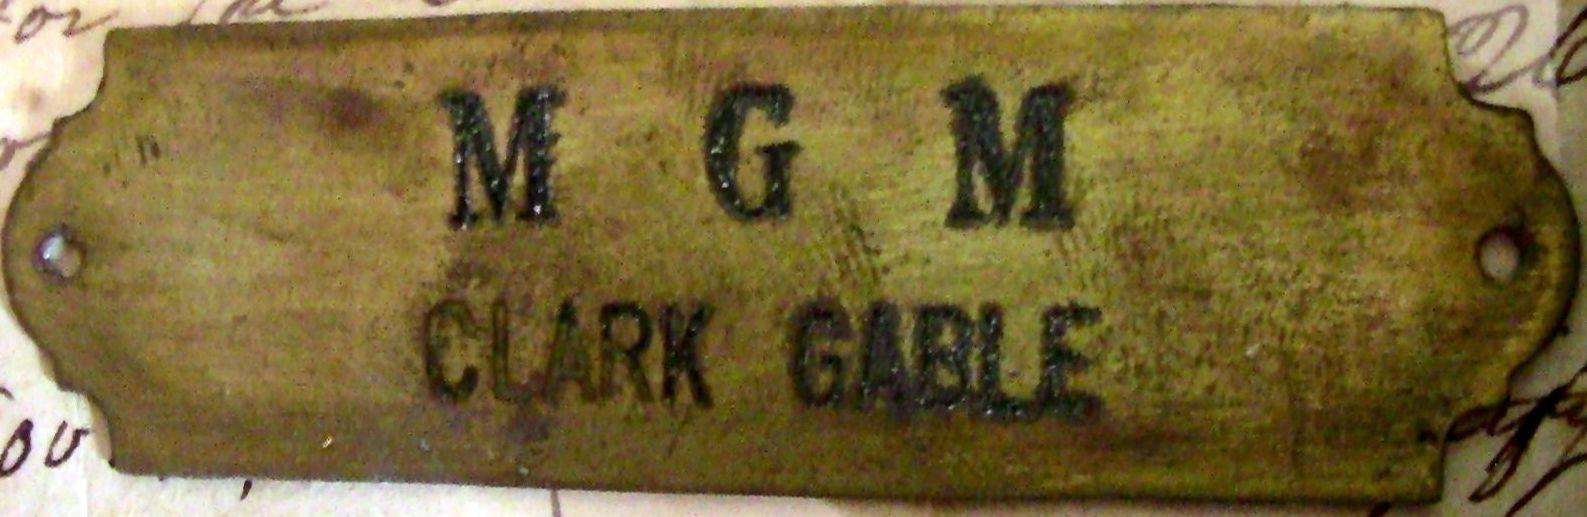 carole lombard clark gable dressing room tags 02a